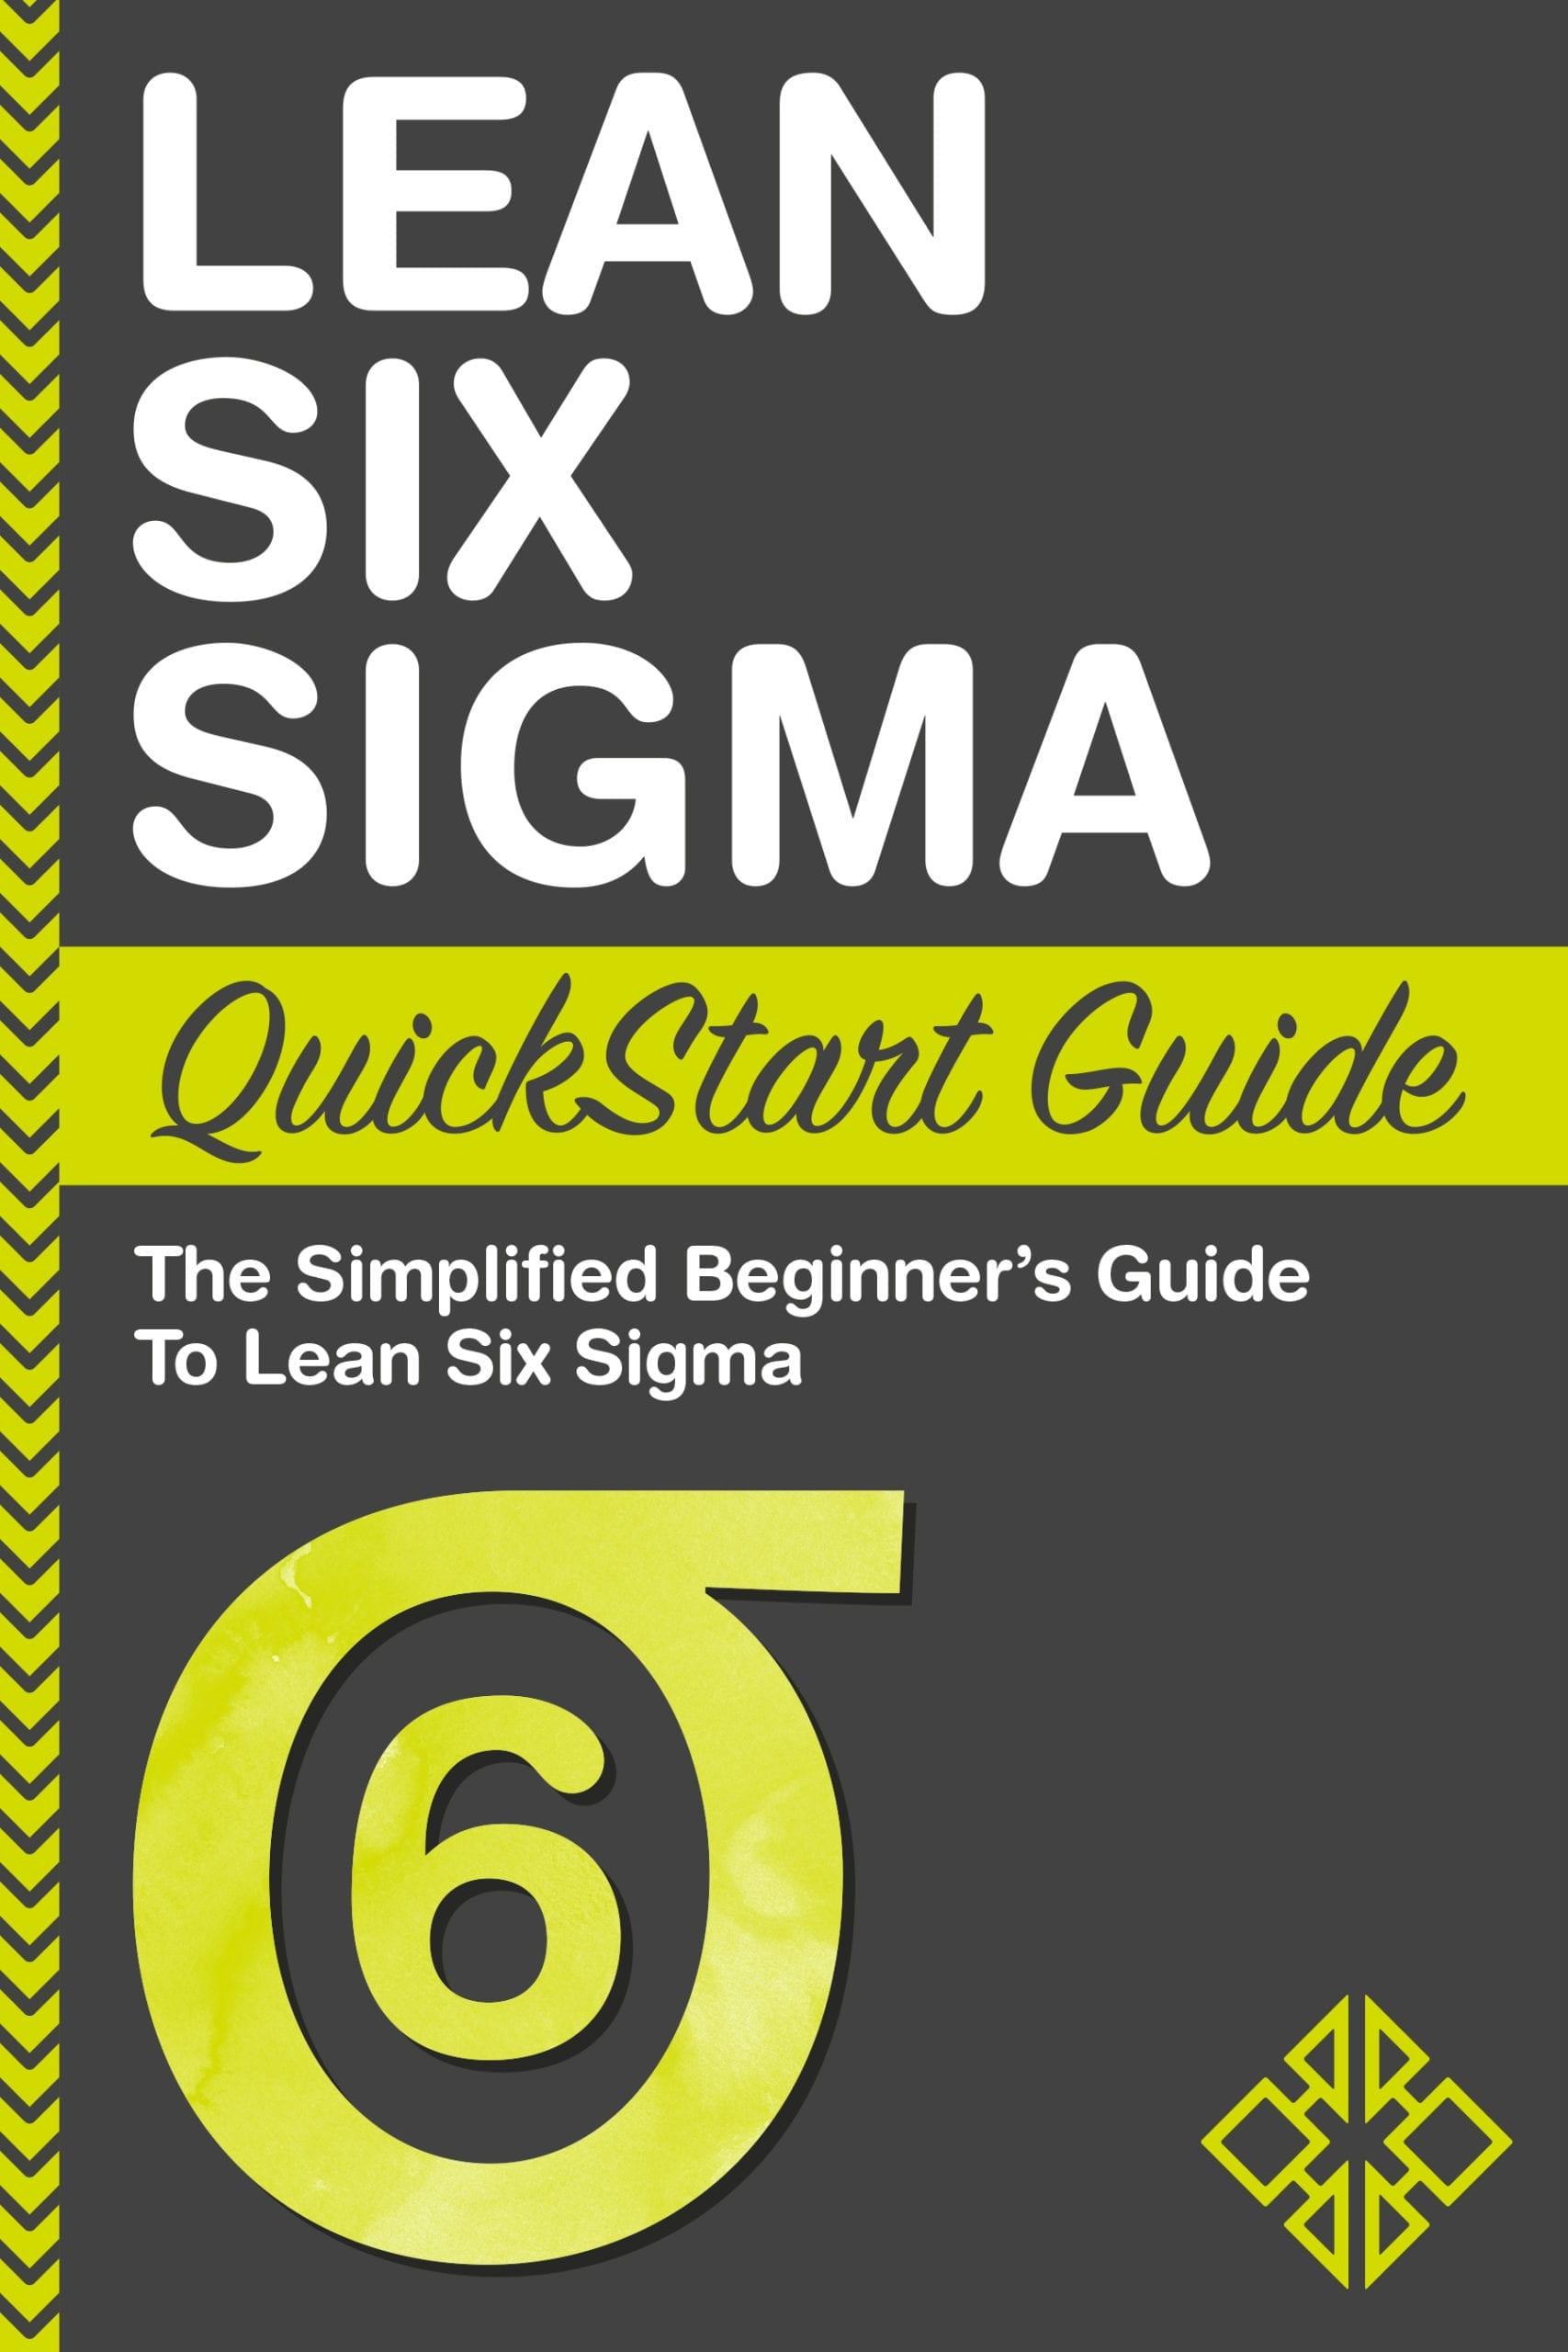 Lean Six Sigma Cover